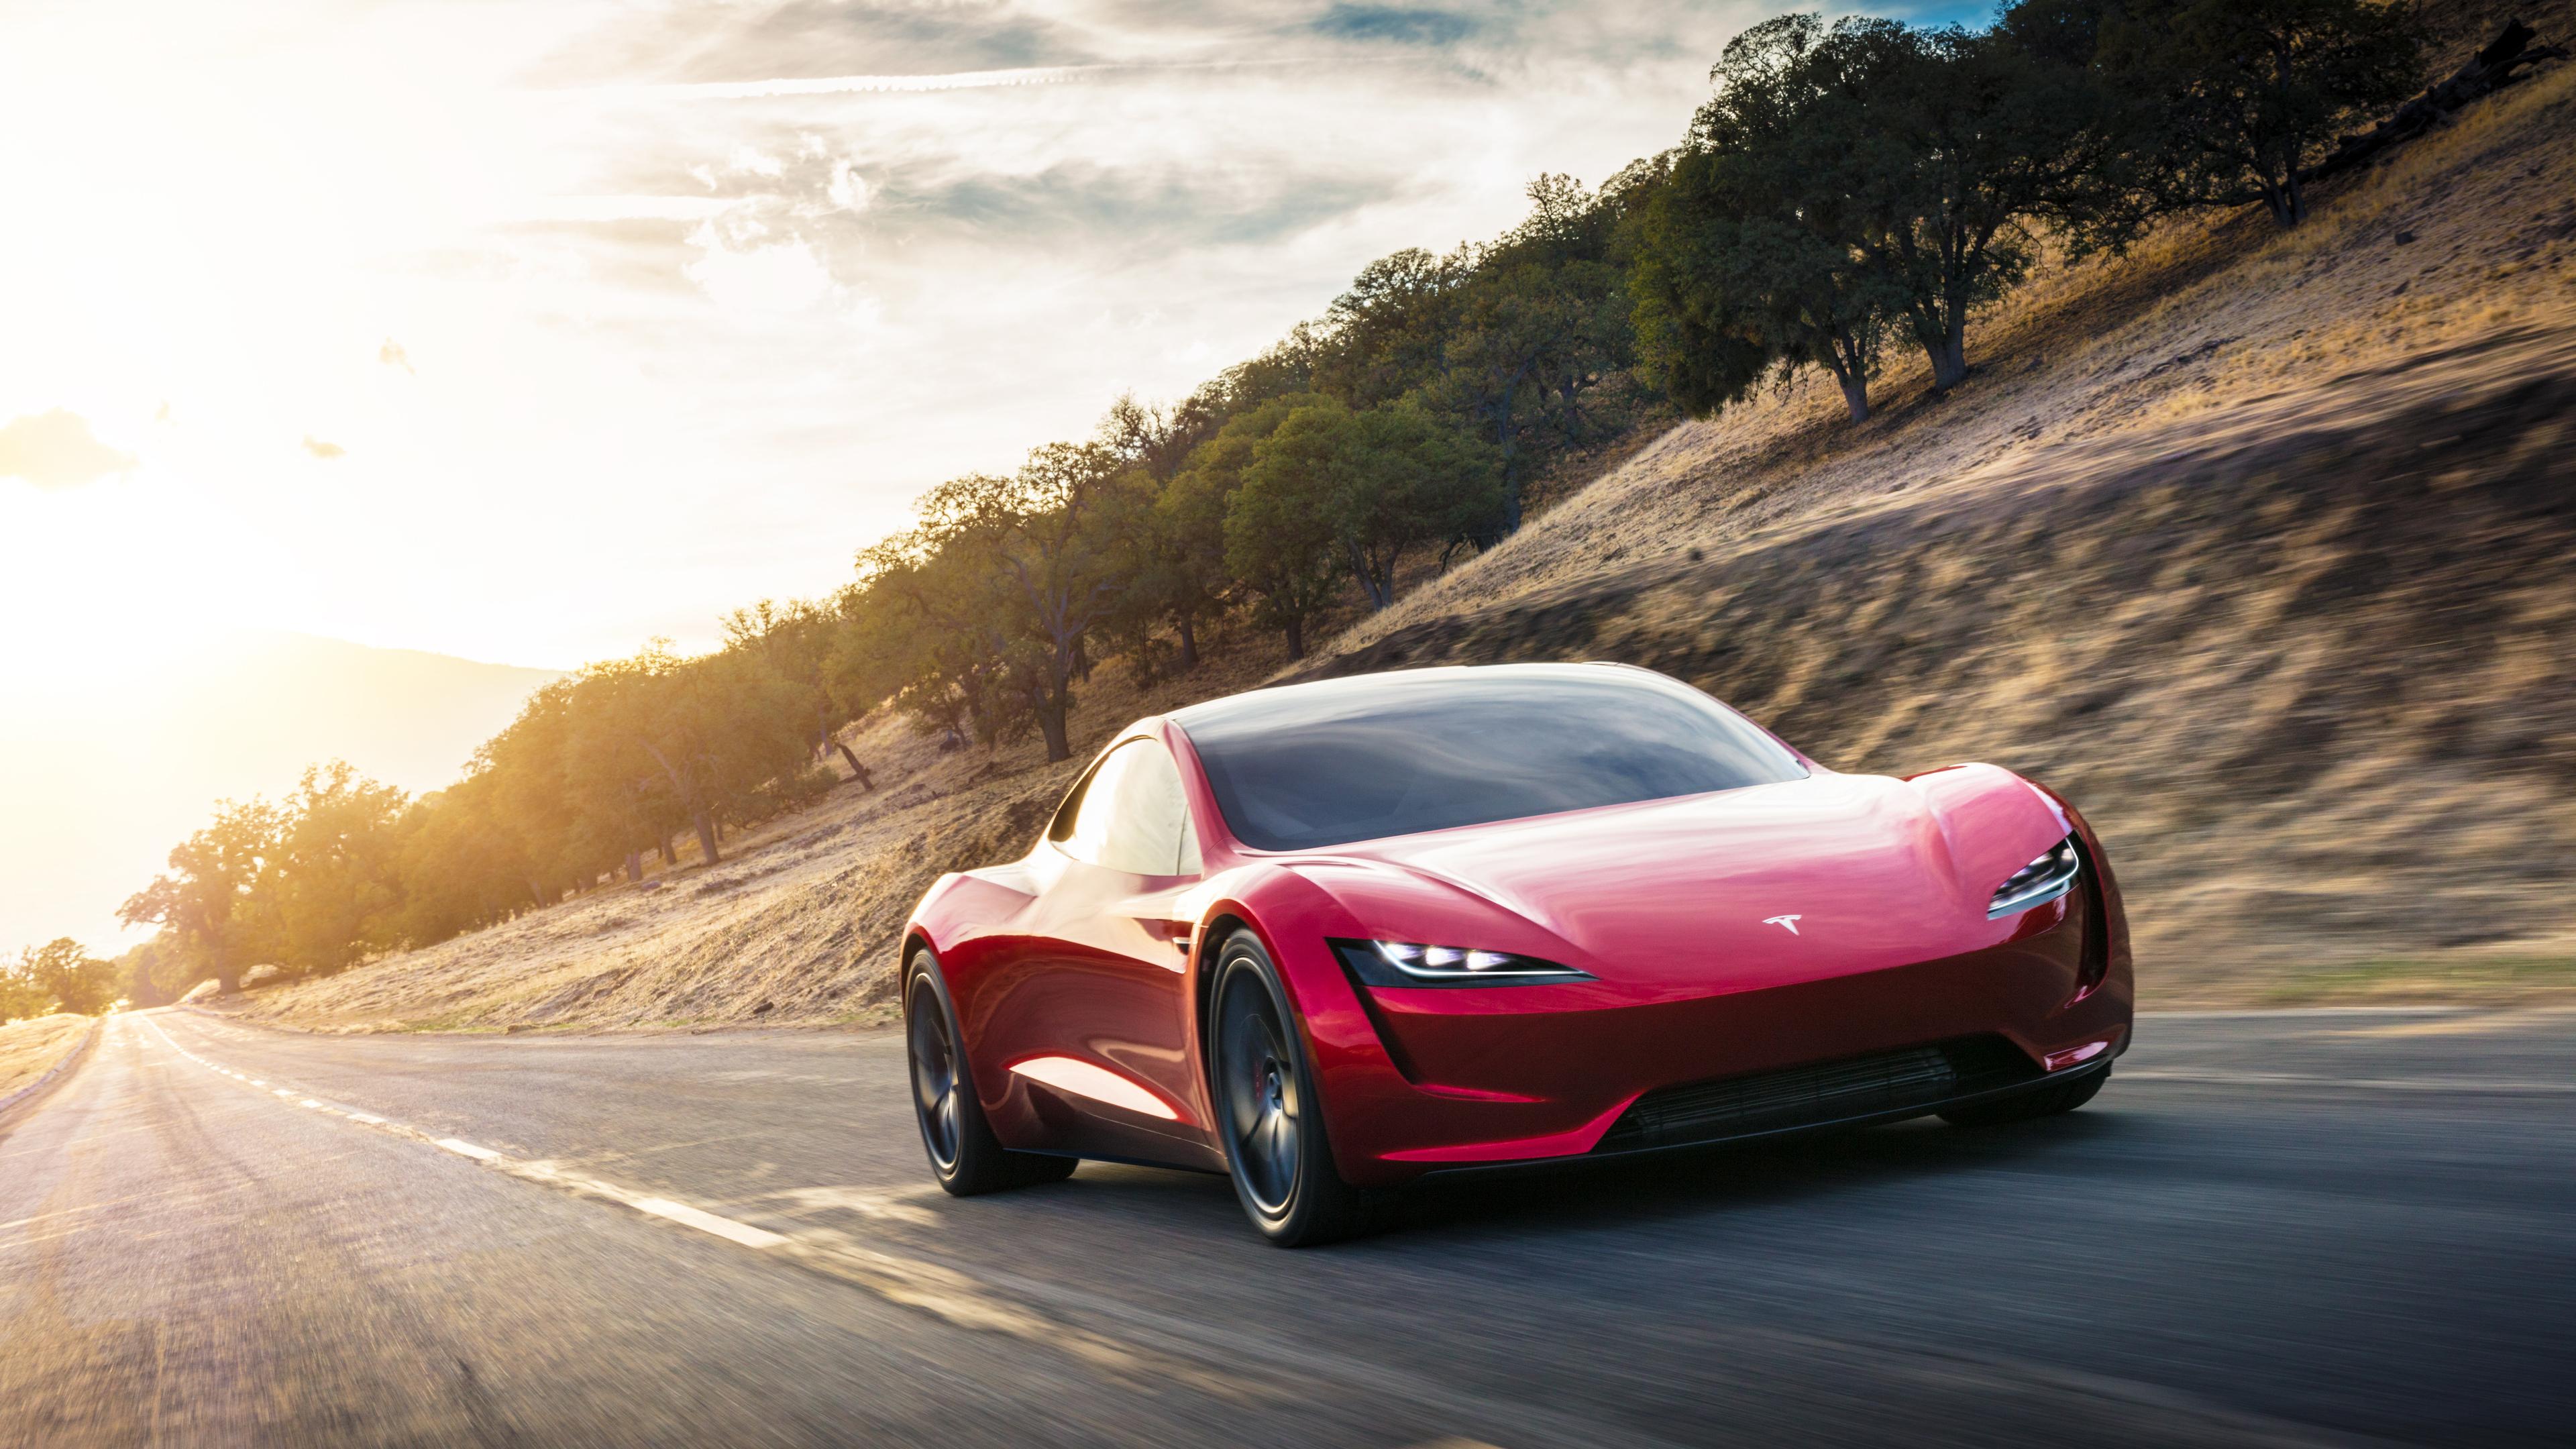 Download New Tesla Roadster Black Wallpaper For Windows 0YF 3840x2160